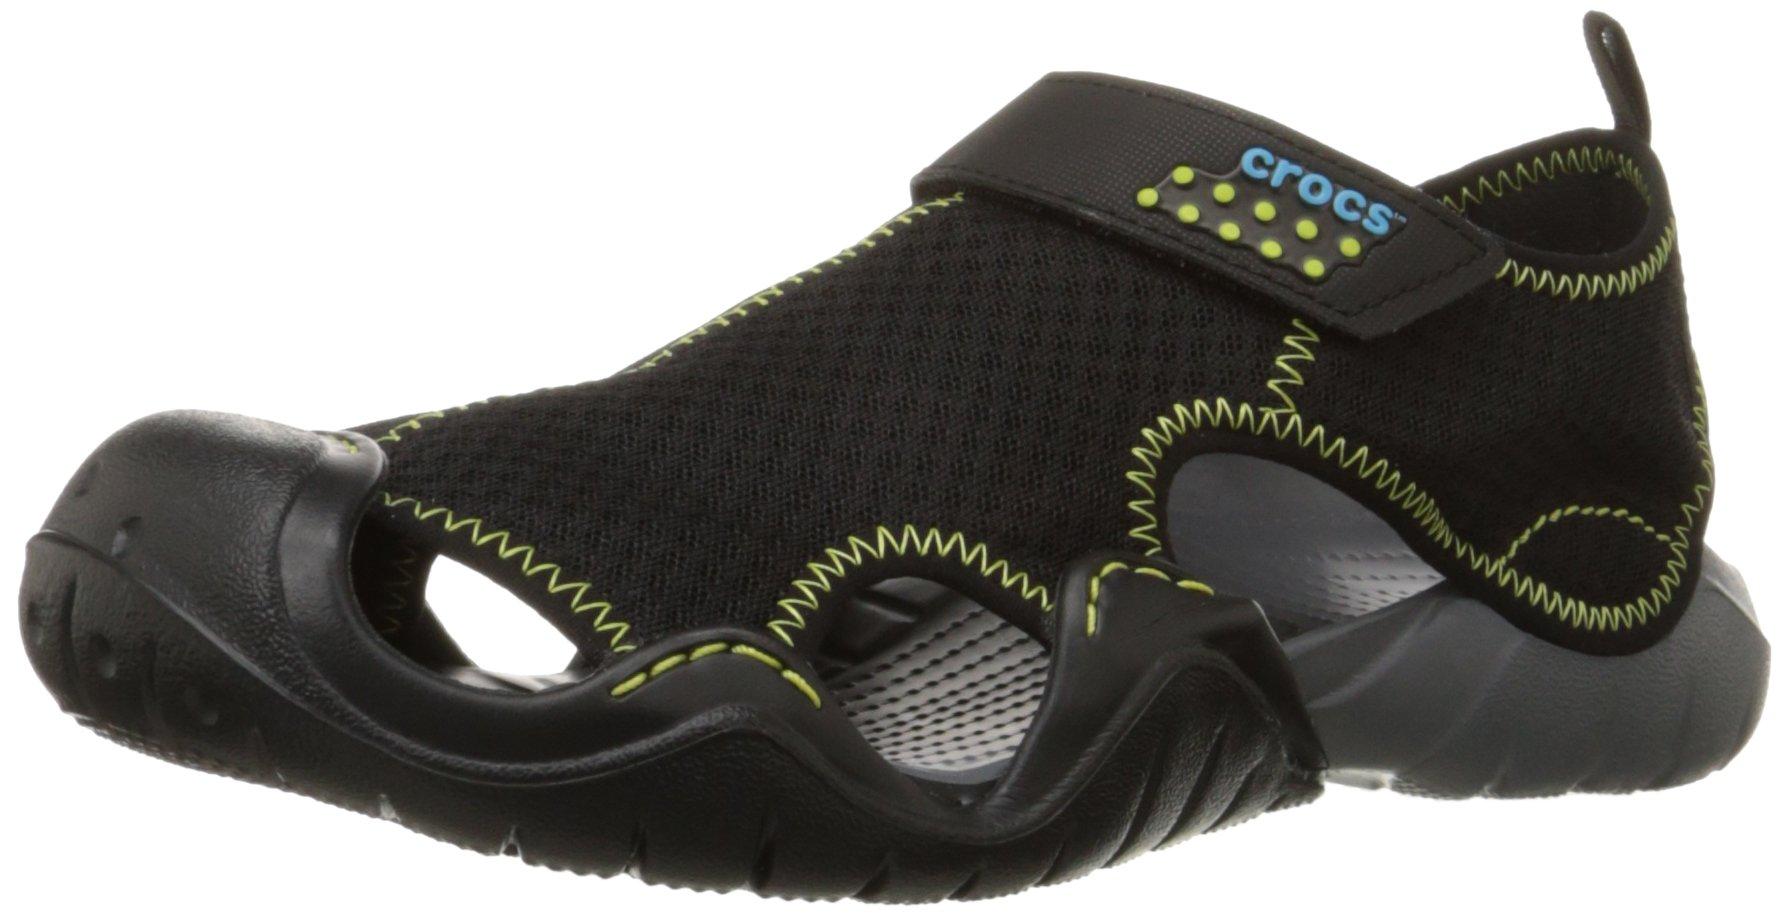 crocs Men's Swiftwater Sandal,Black/Charcoal,9 M US